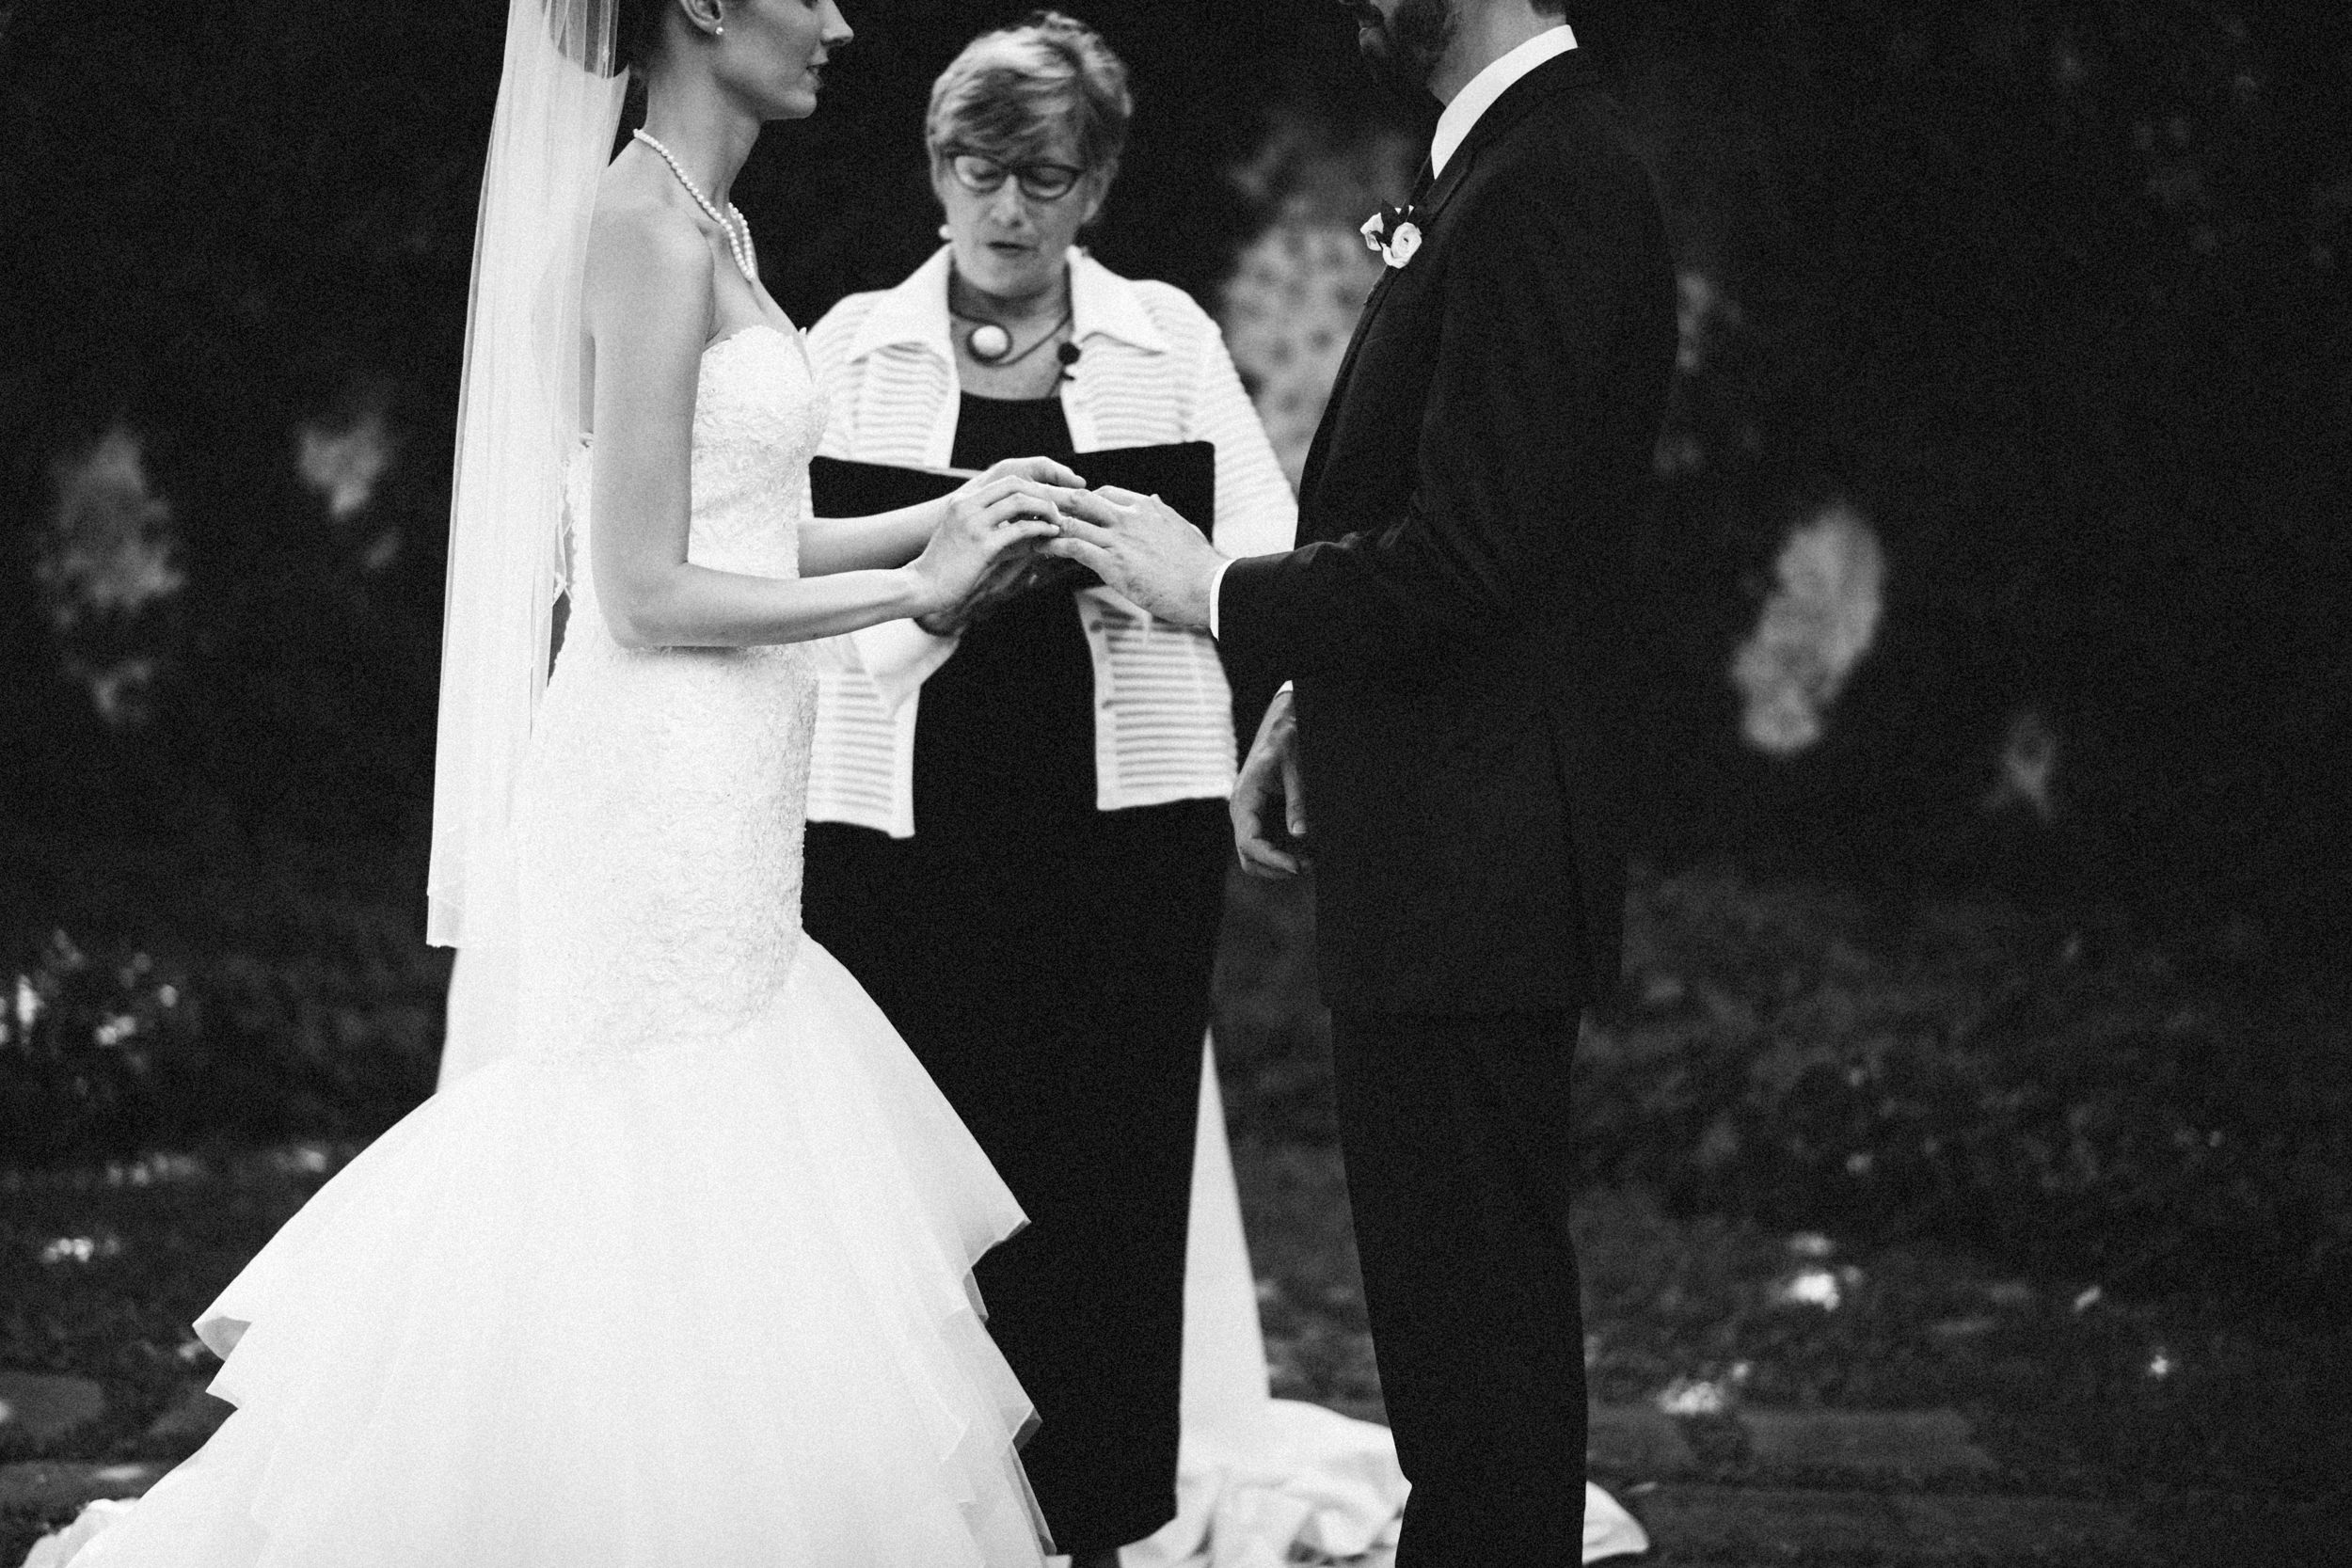 Louisville-Kentucky-Wedding-Elopement-Photographer-Sarah-Katherine-Davis-Photography-Whitehall-Classic-Timeless-Garden-Wedding-404.jpg